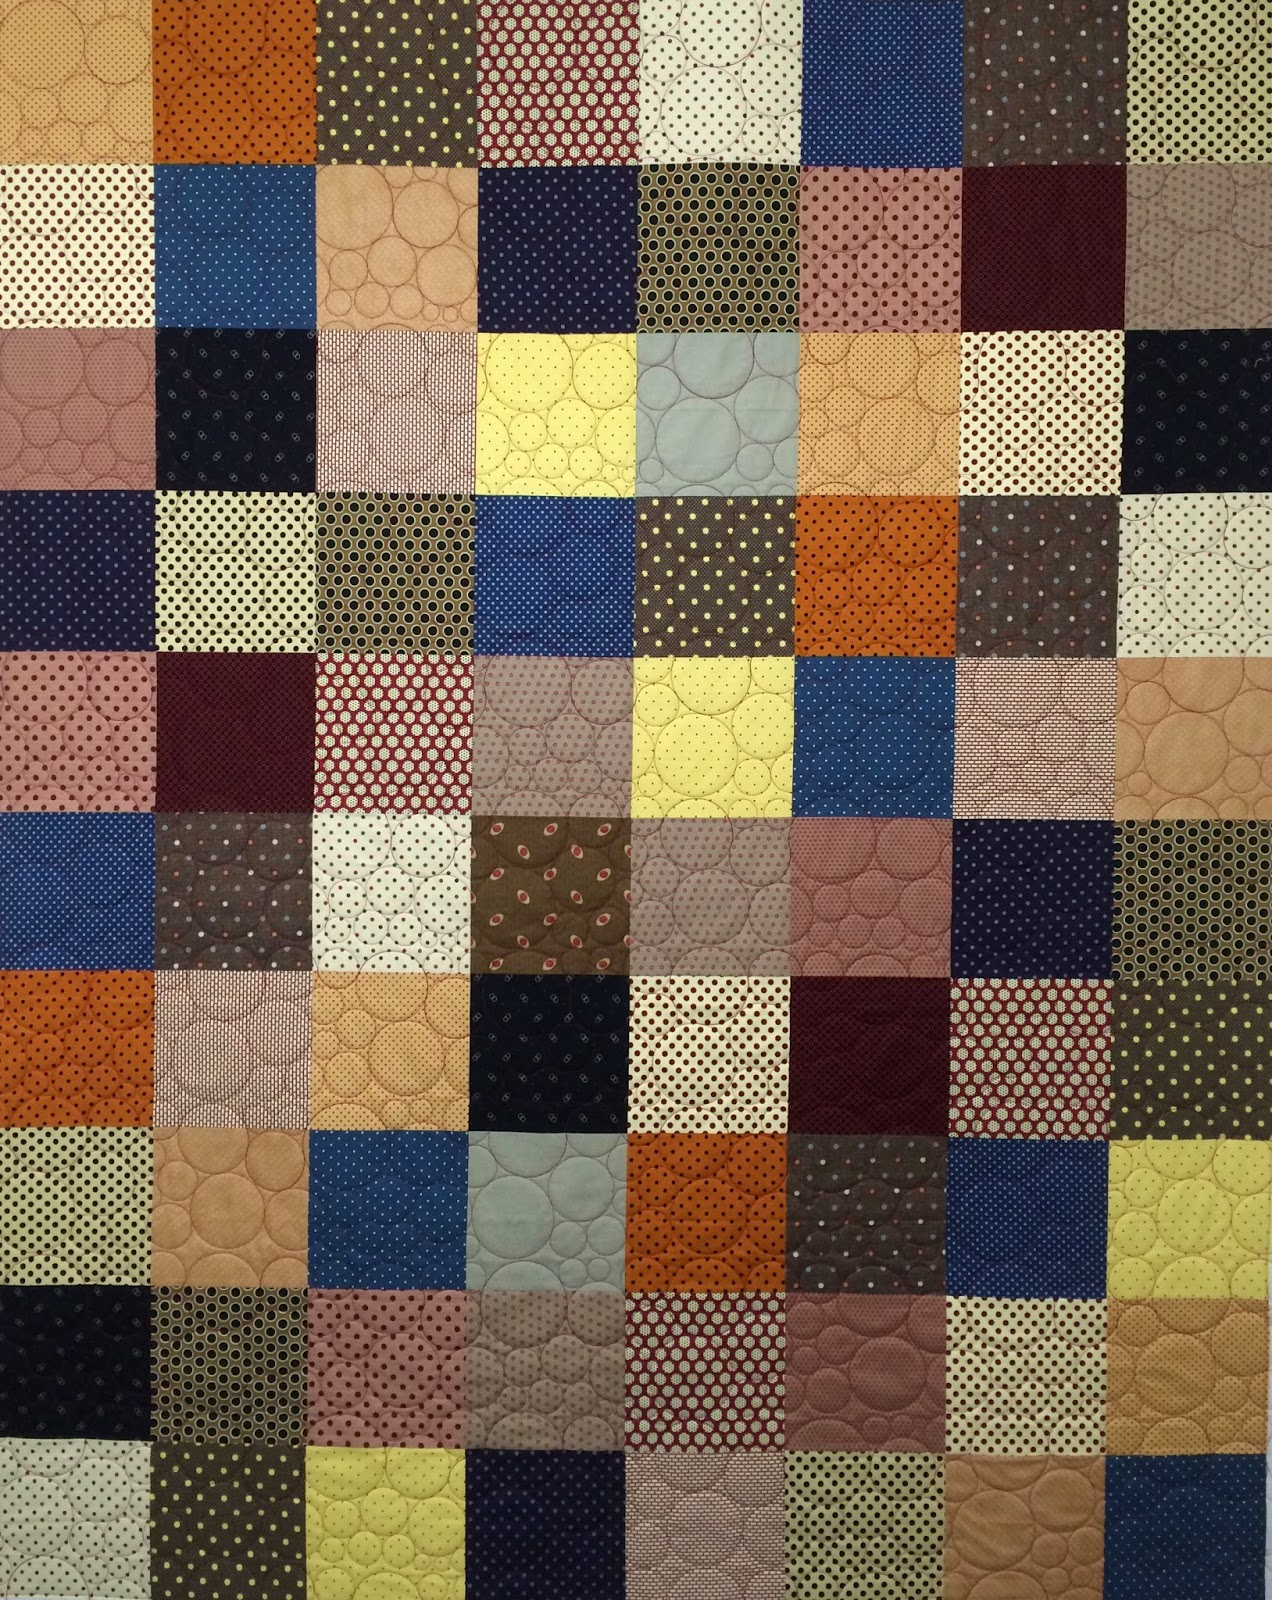 Mette Brown's Polka Dots Quilt